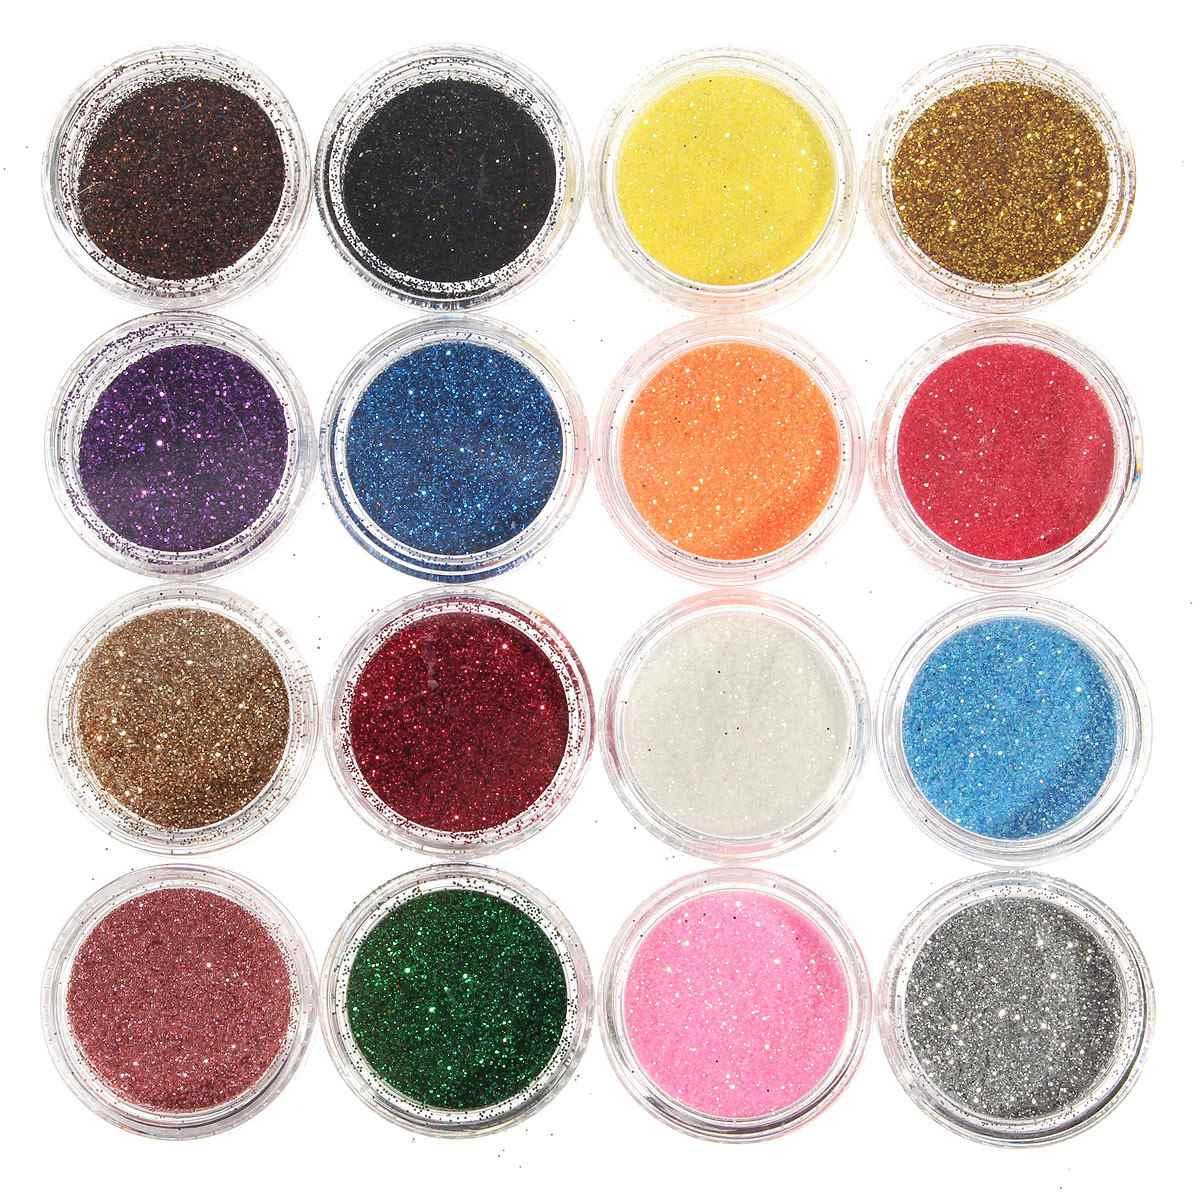 Hot Sale New 16 Mixed Colors Pigment Glitter Powder Mineral Spangle Eyeshadow Makeup 16pcs One Set Maquiagem(China (Mainland))